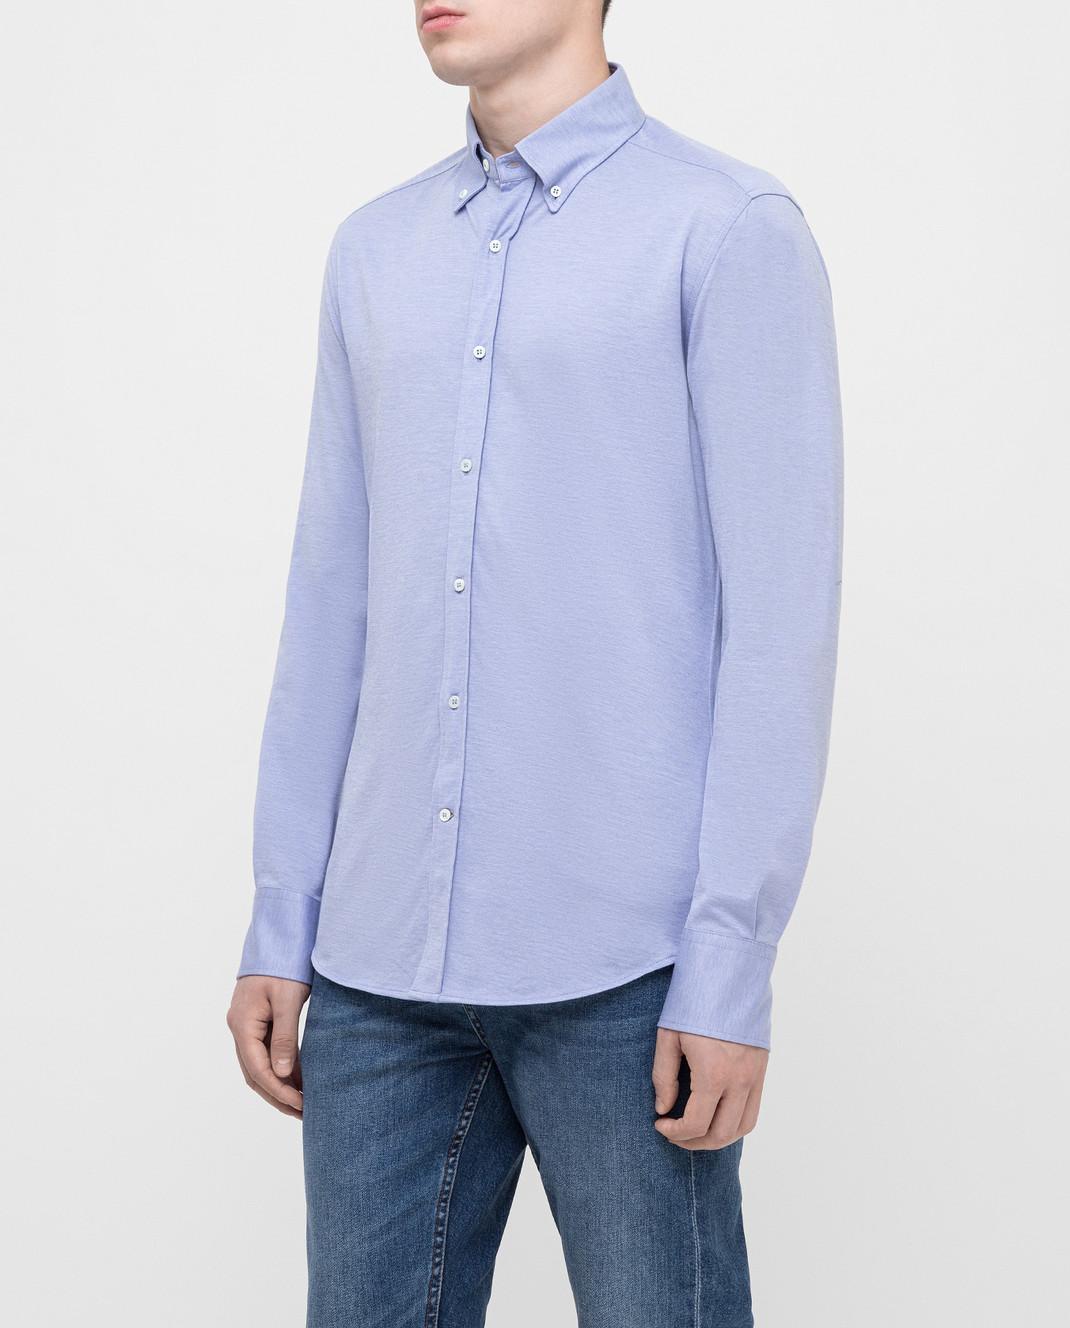 Brunello Cucinelli Голубая рубашка MTS406676 изображение 3